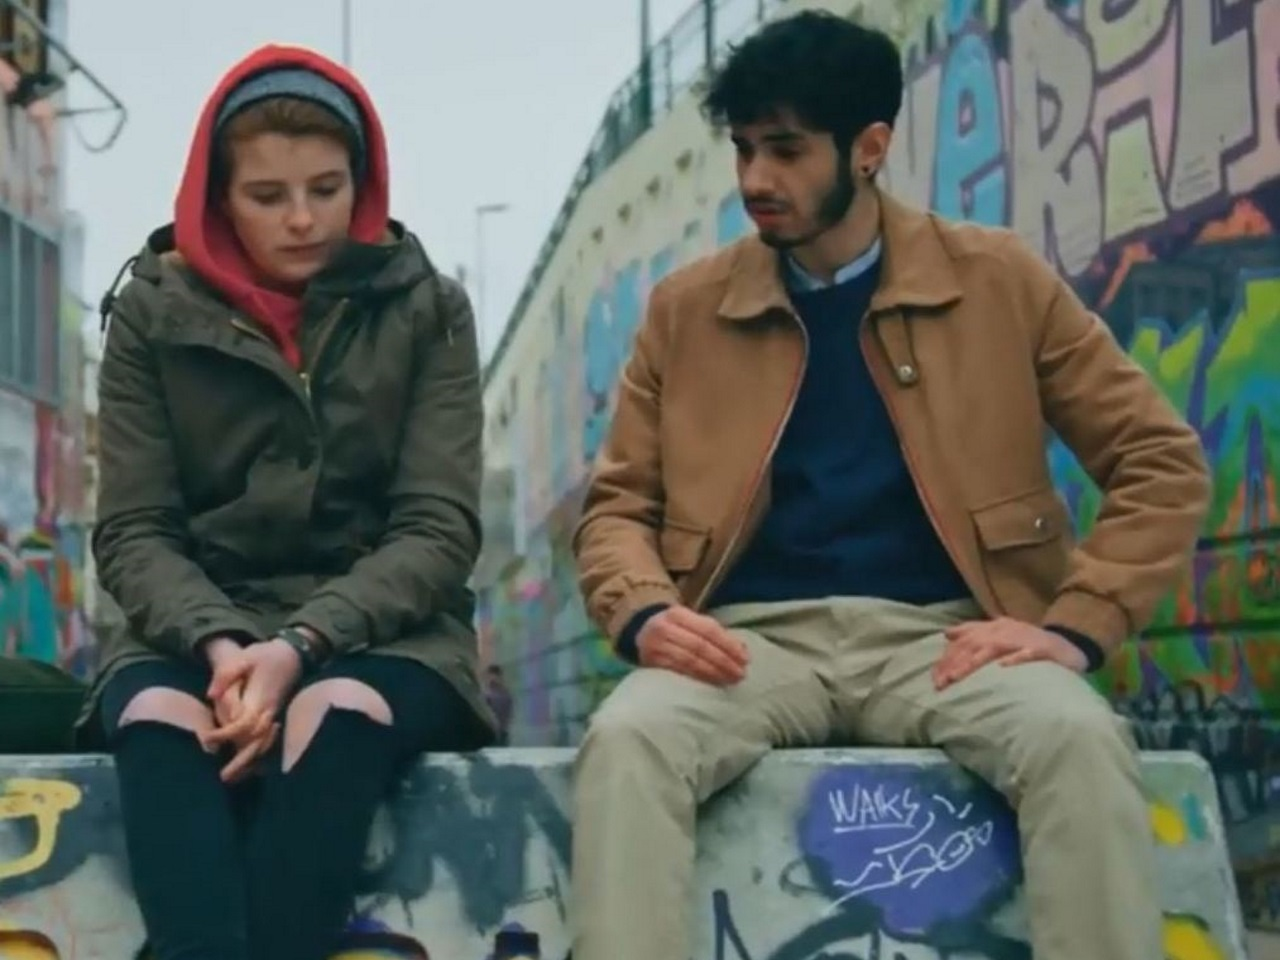 Plus belle la vie (France 3) rend hommage à Arnaud Beltrame